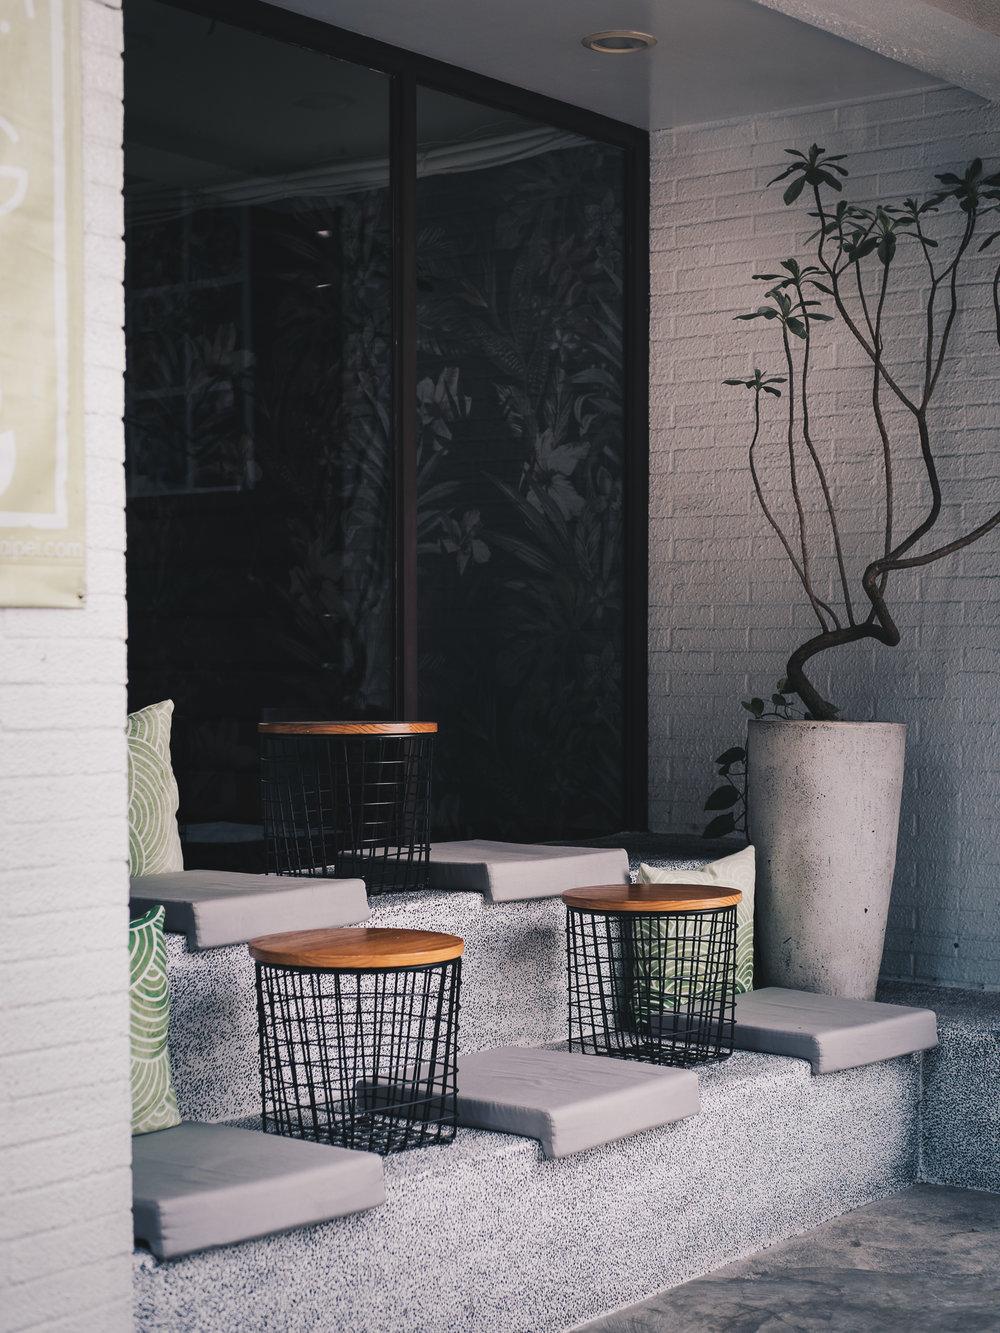 Miss Green Vegan Restaurant Taipei - 10-10 Hope - Olympus E-M1Markii 2512 - Yes! Please Enjoy-4.jpg